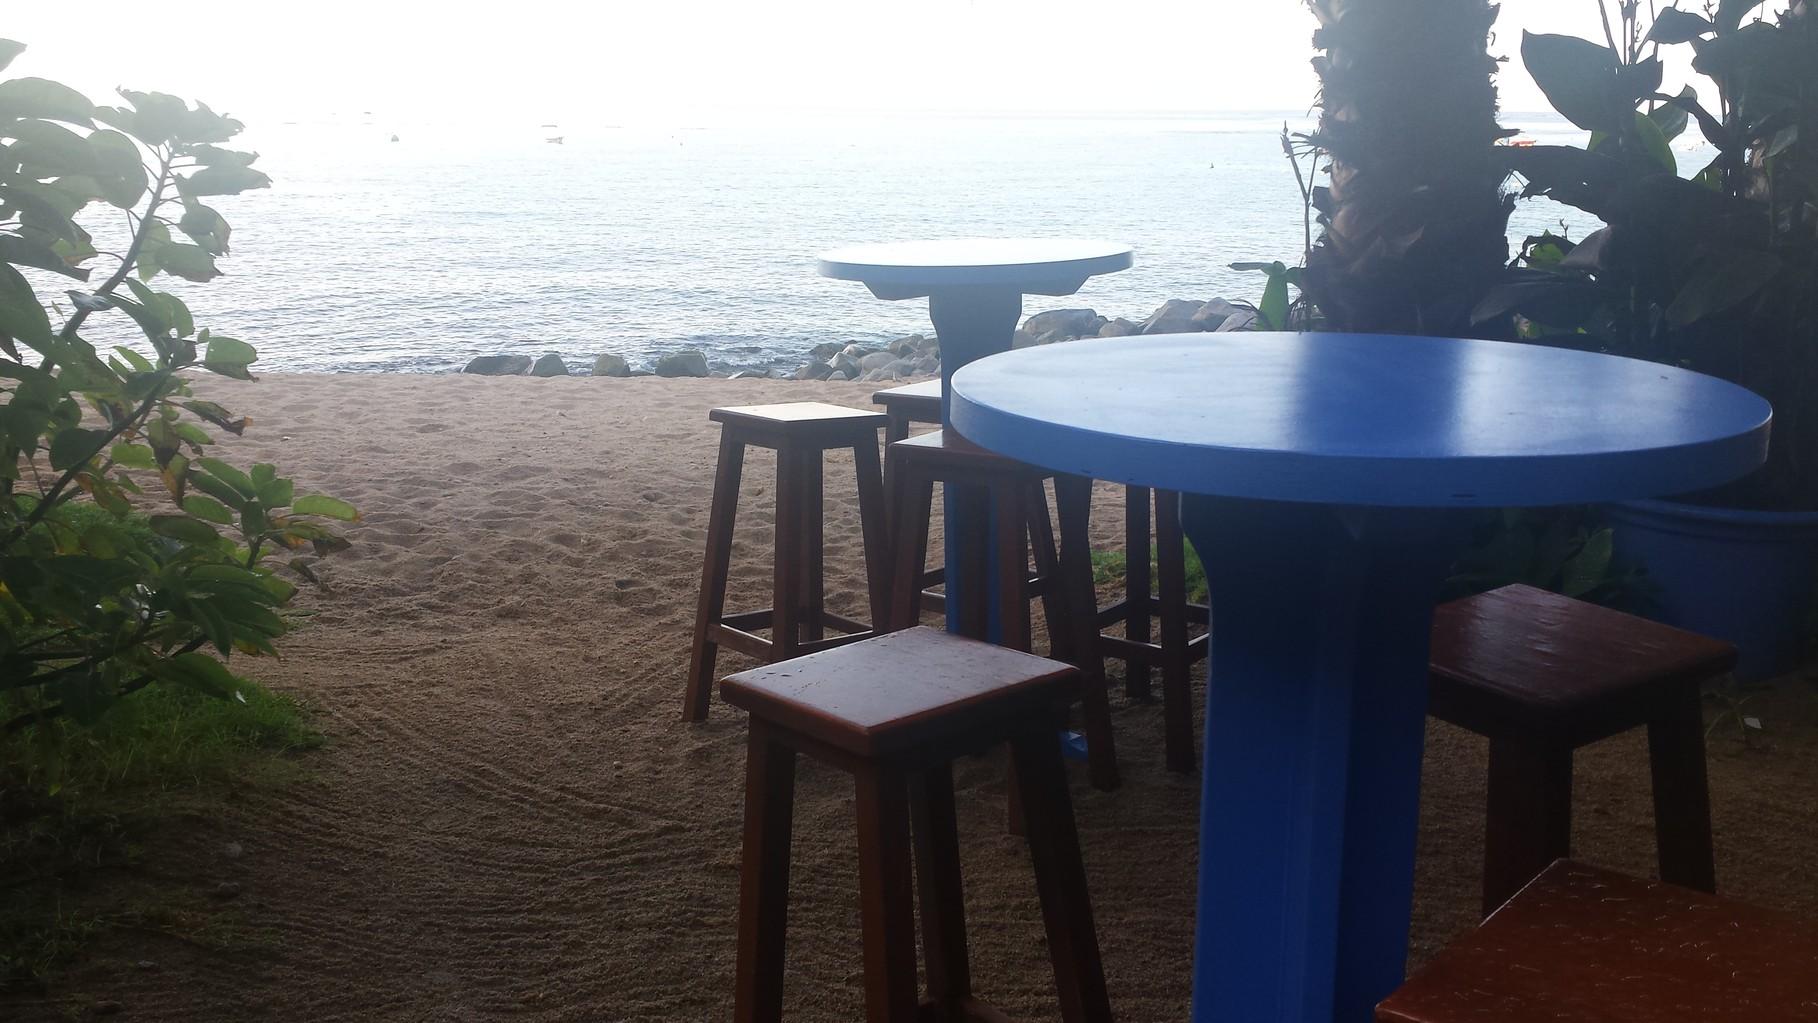 Beach Club bar-restaurant on Cala Llevadó beach less than a kilometer away